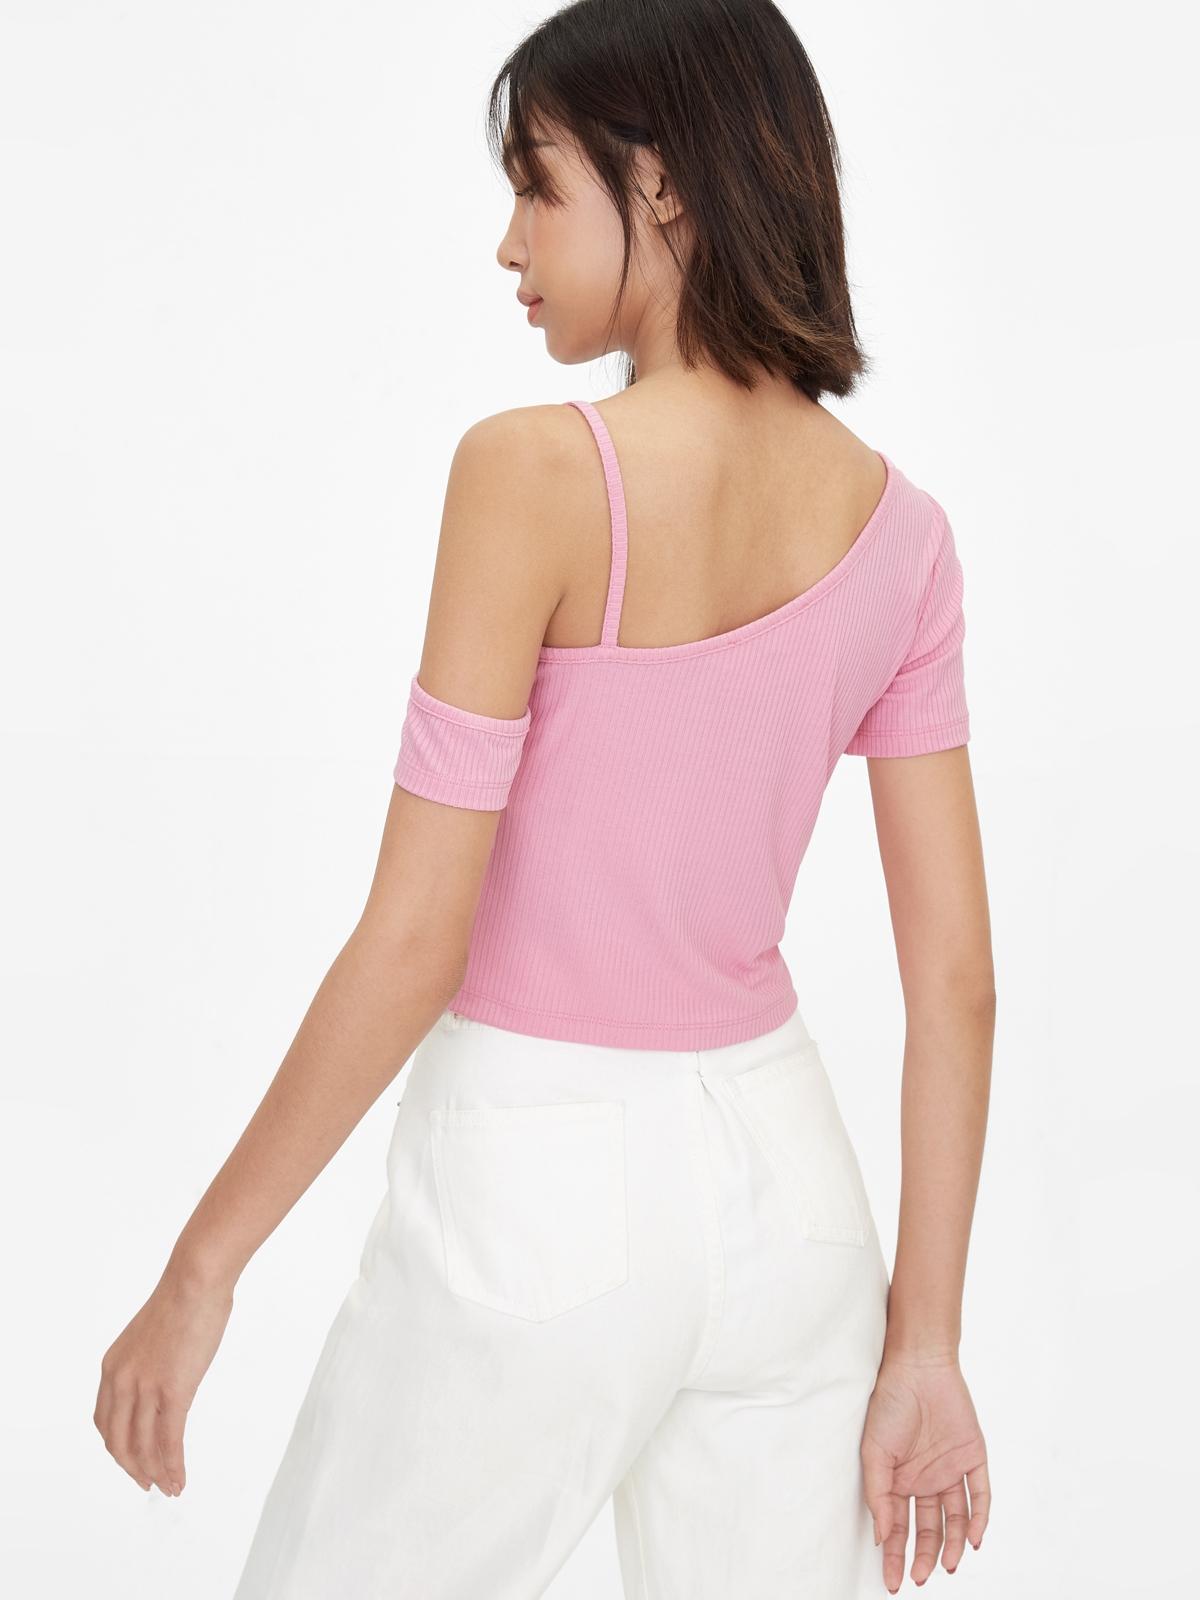 One Shoulder Strap Crop Top Pink